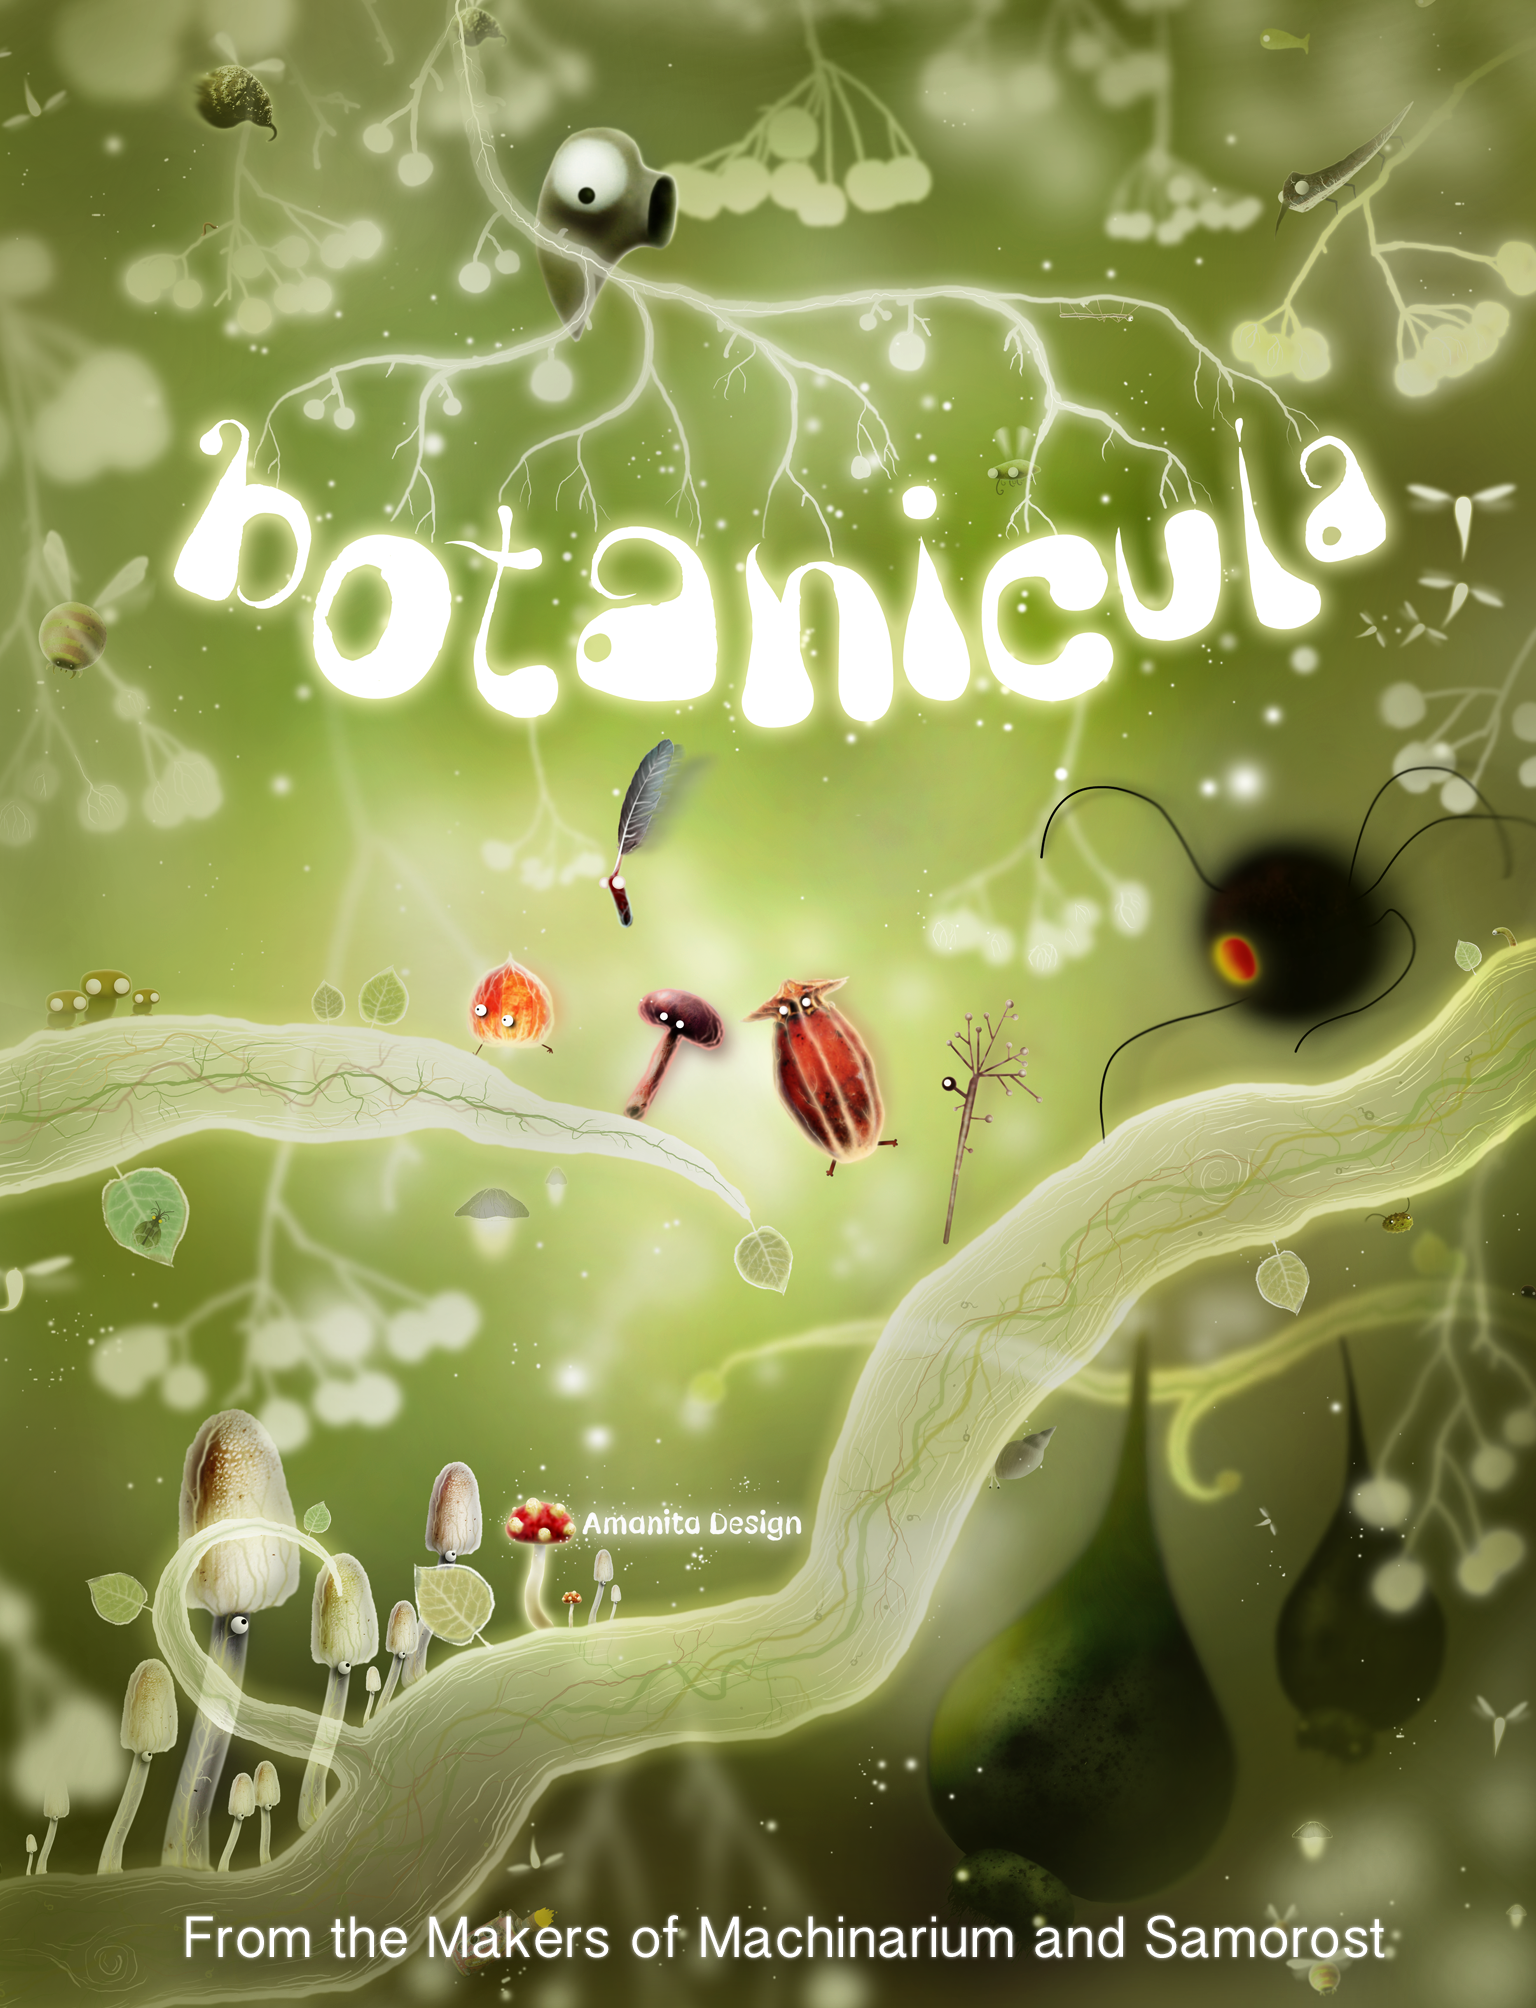 Botanicula screenshot #1